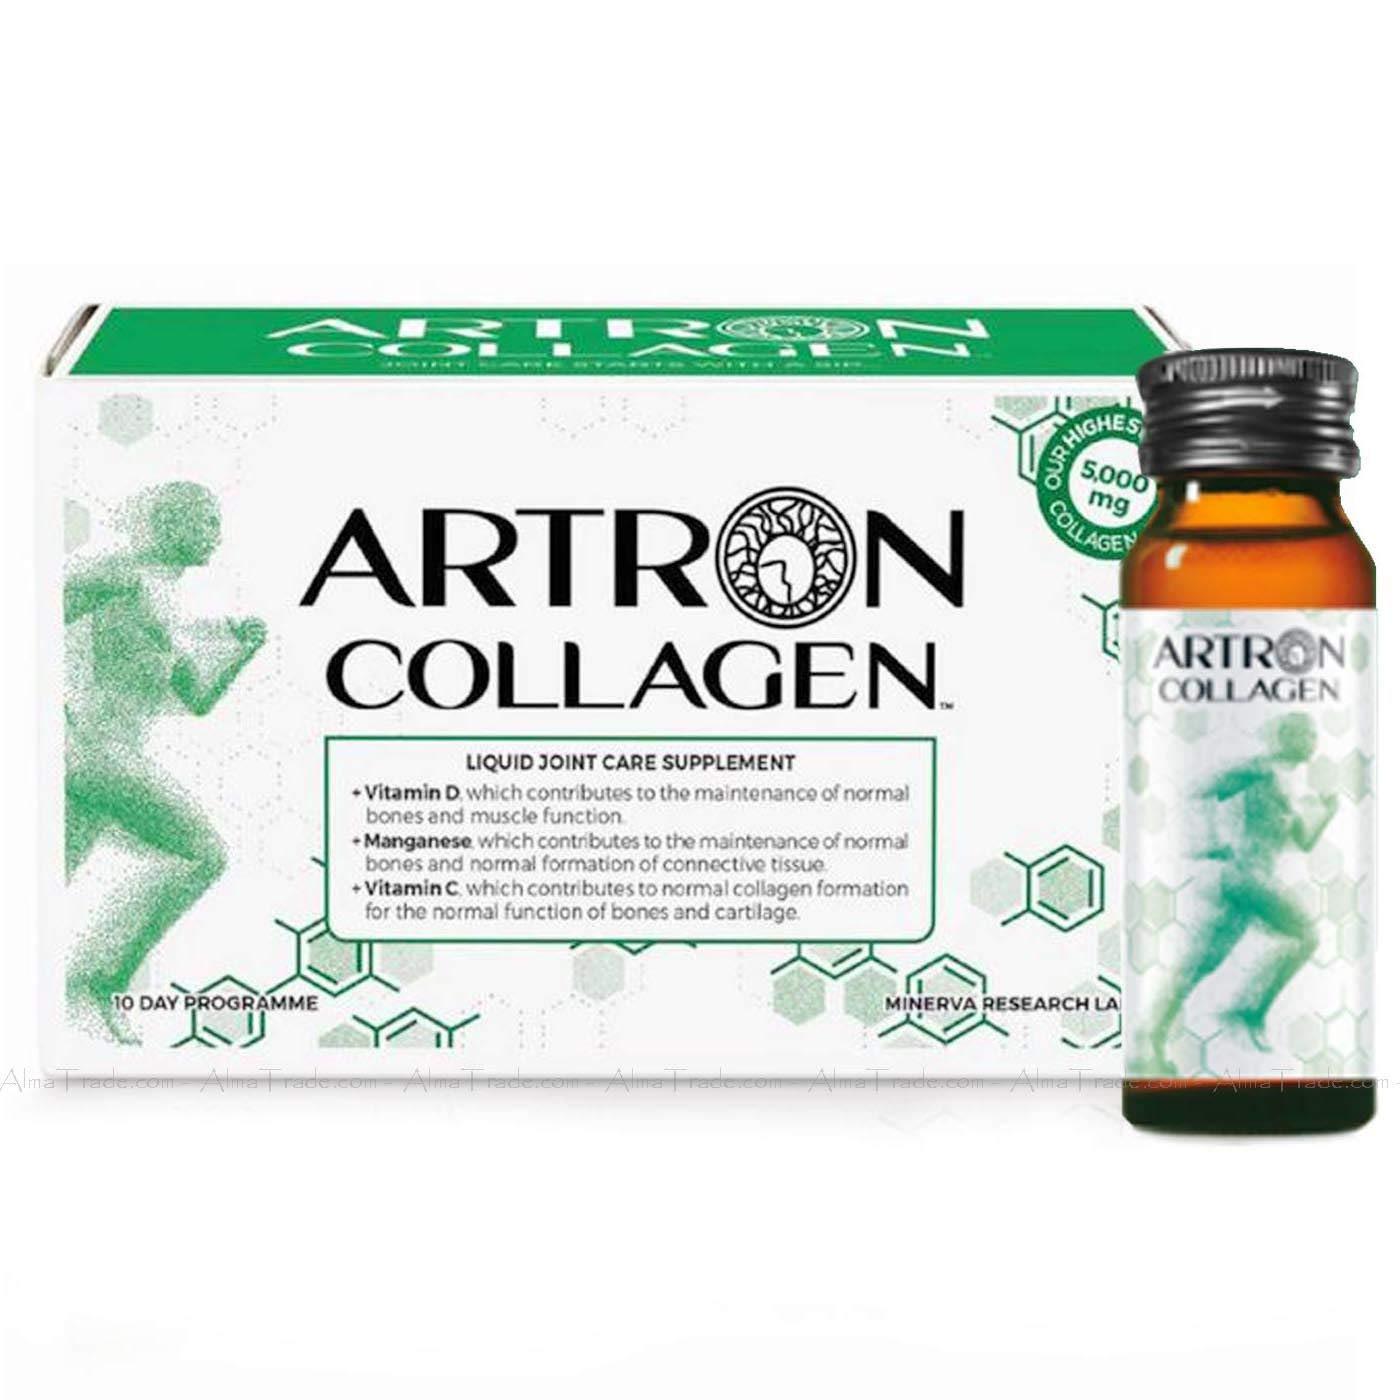 Artron Collagen Joint Care Liquid Supplement 10 Day Program Bone Support 10x30ml £15.99 + £4.49 delivery Non Prime @ Amazon